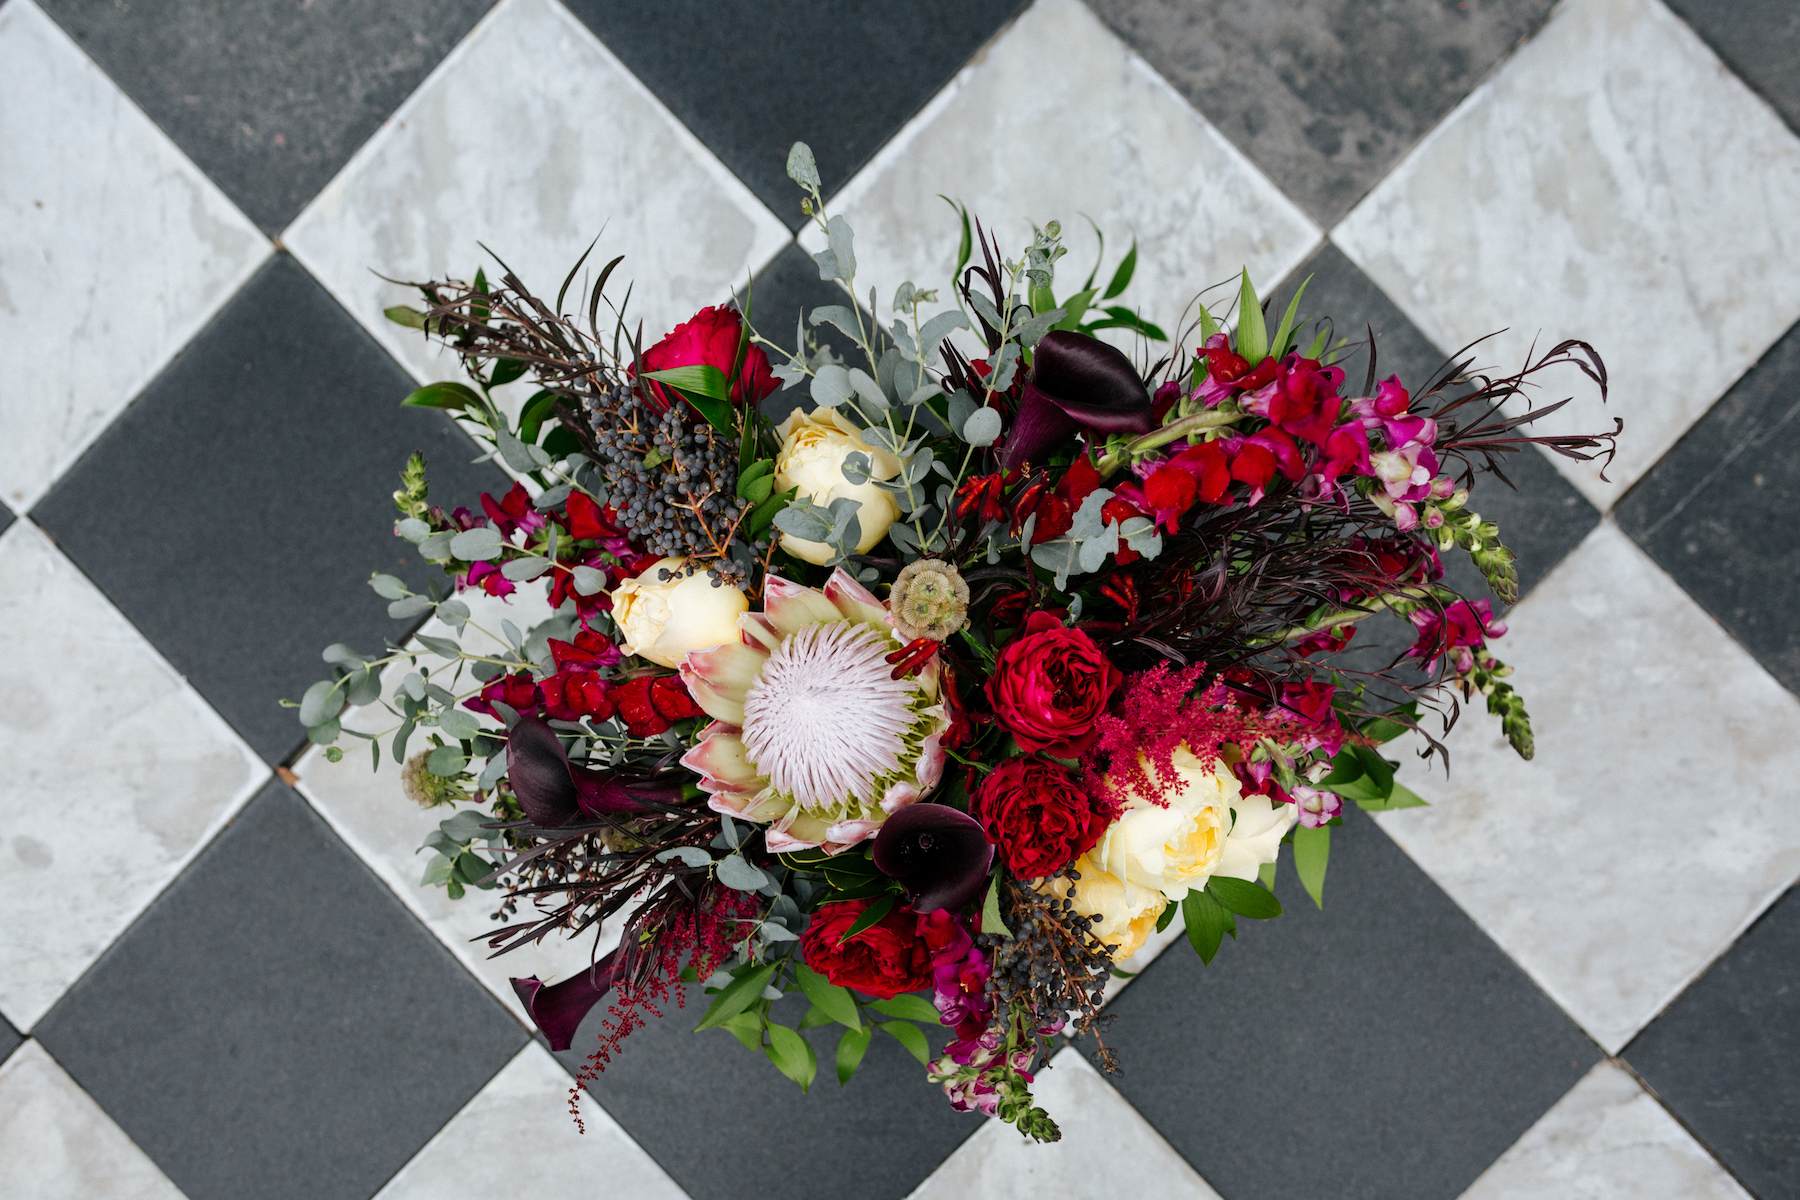 Summerall-Chapel-Historic-Rice-Mill-Wedding-017.JPG